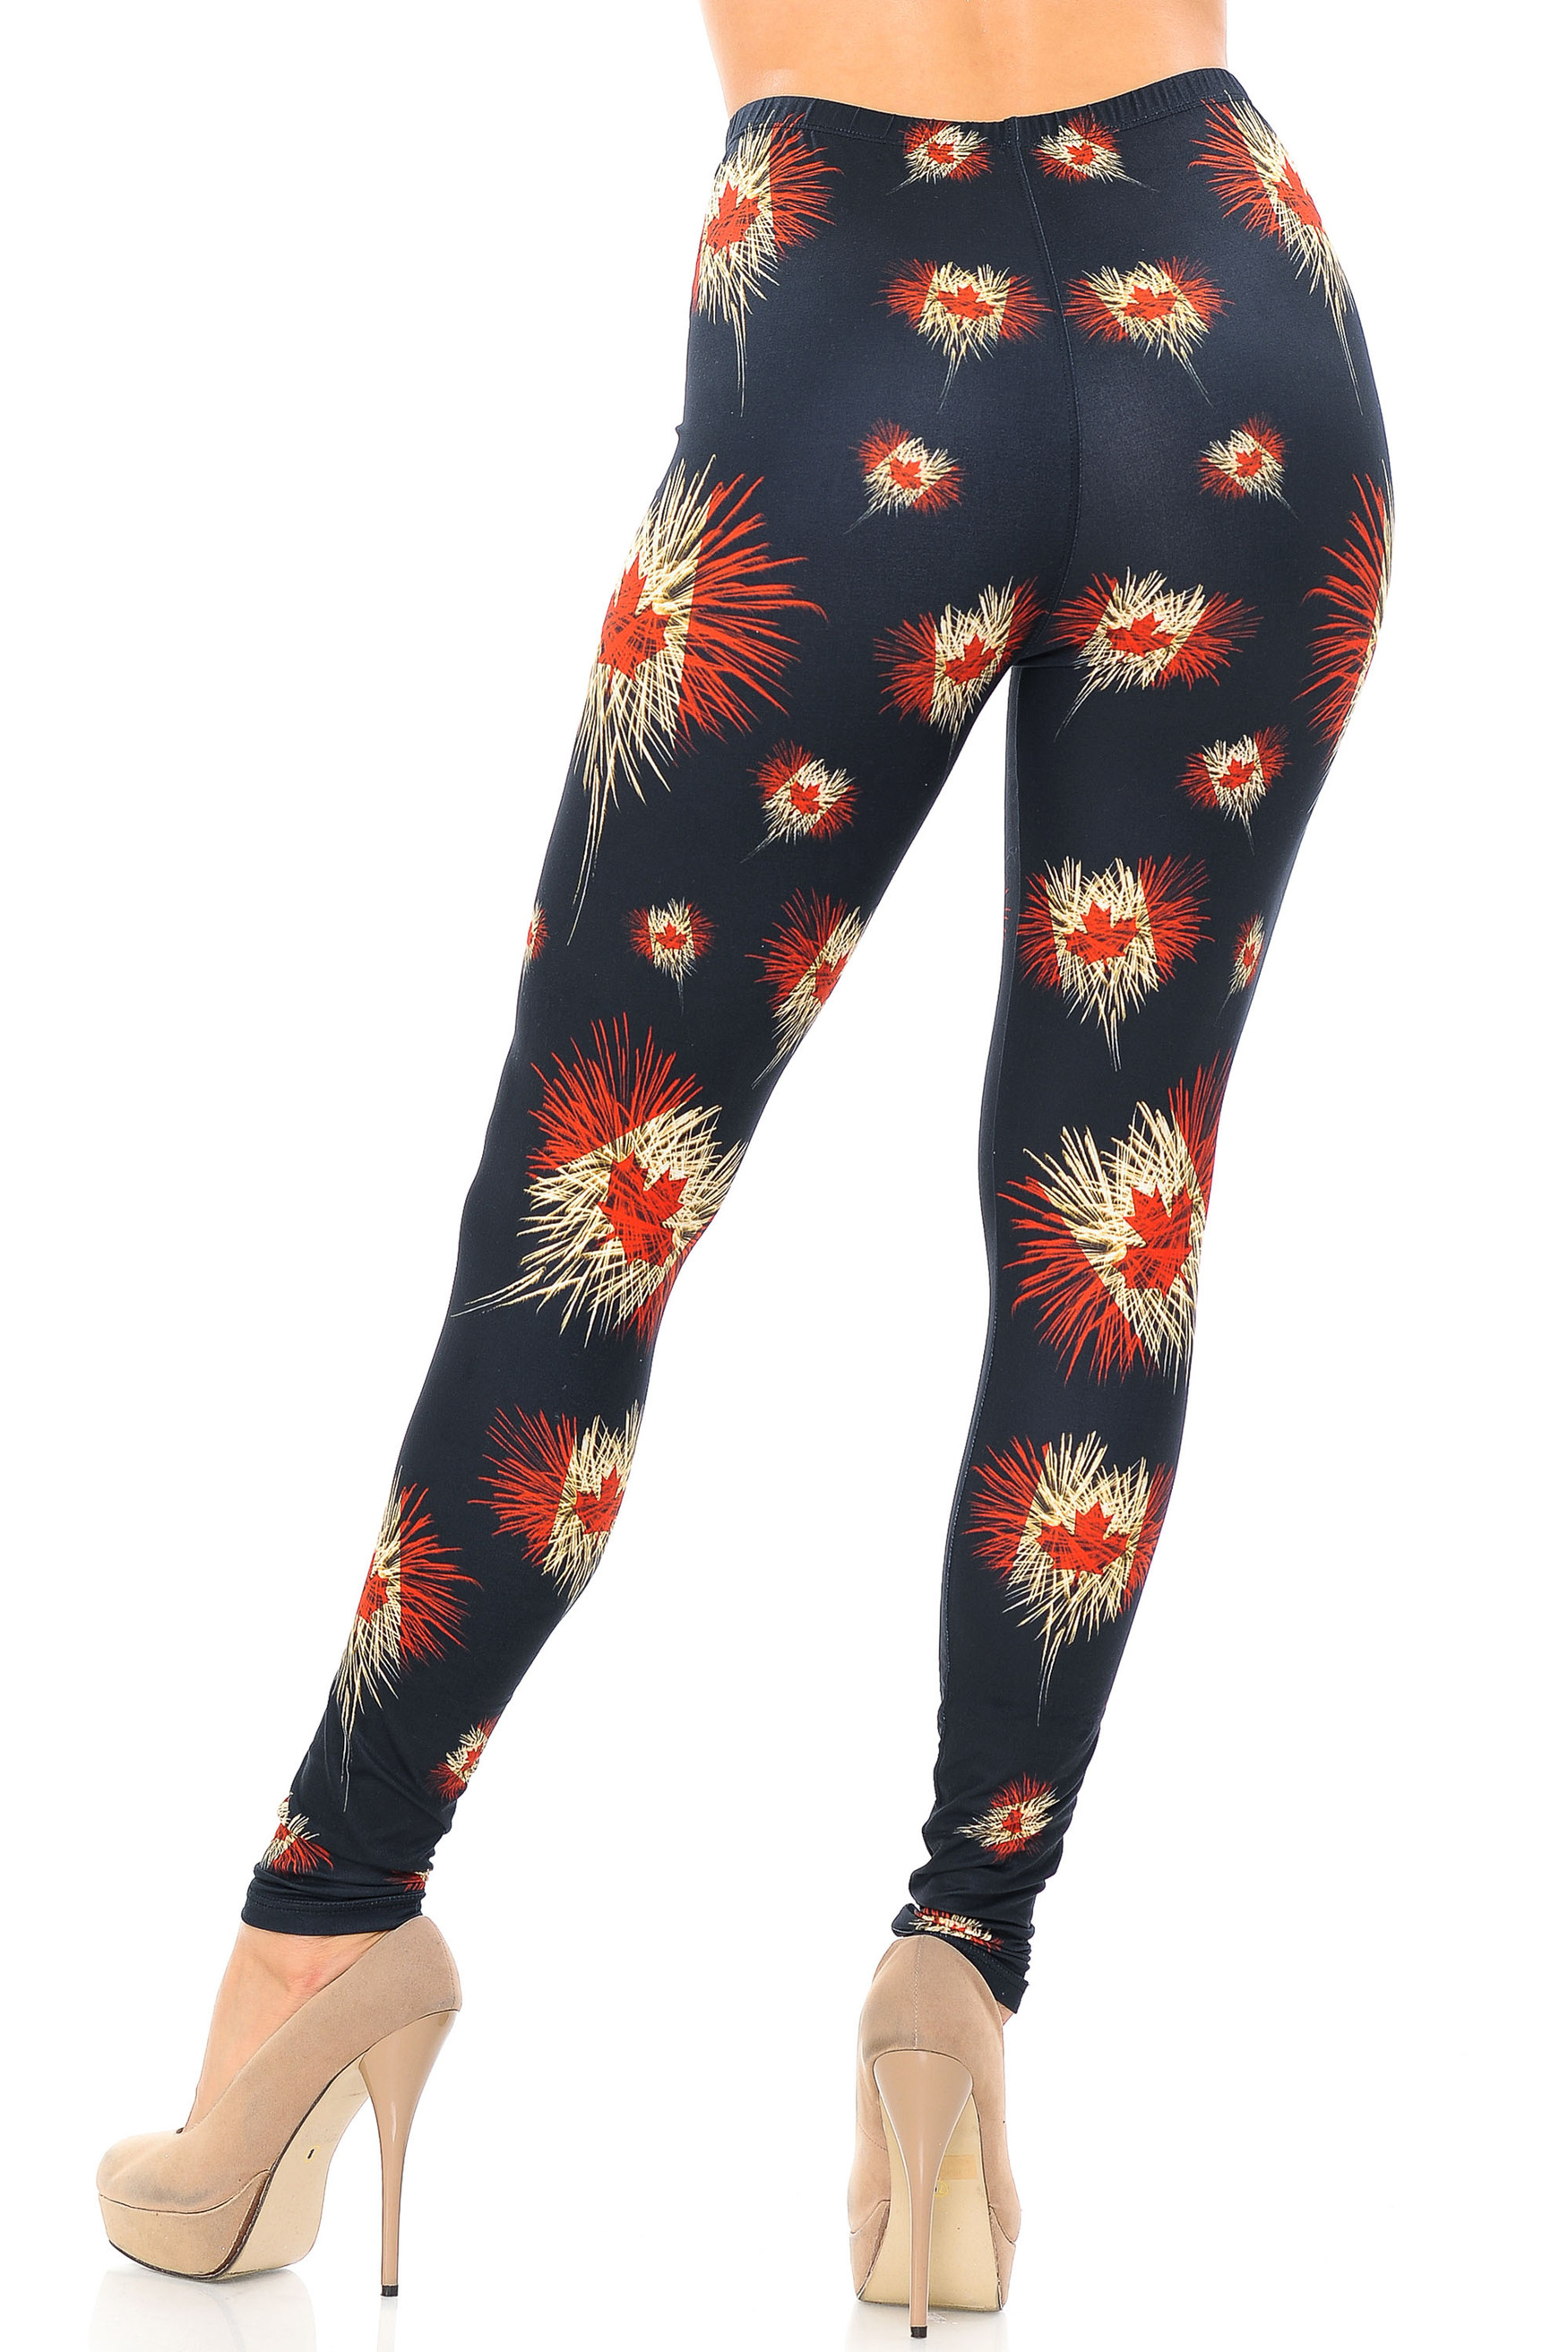 Creamy Soft Canadian Flag Fireworks Leggings - USA Fashion™